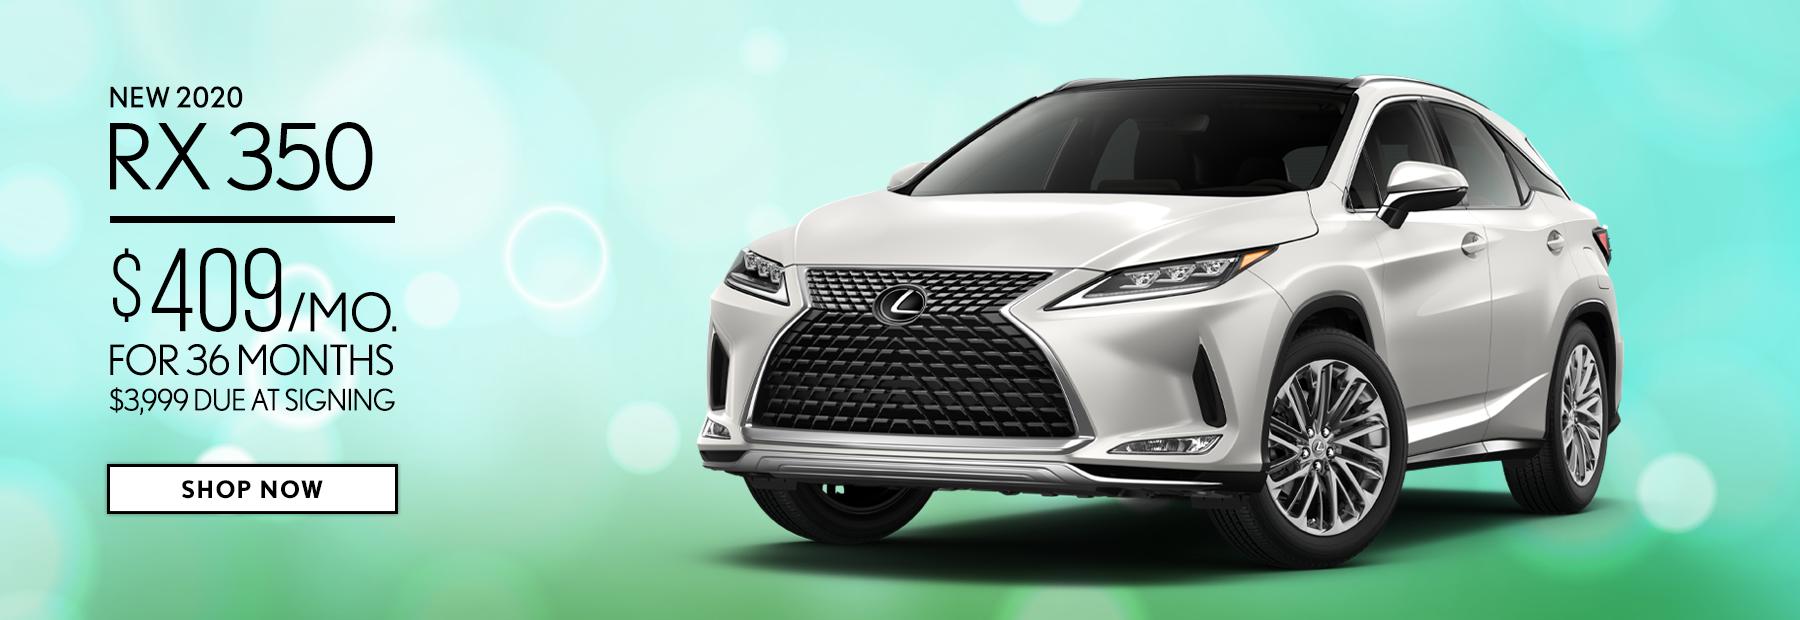 new-lease-2020-performance-lexus-rx-350